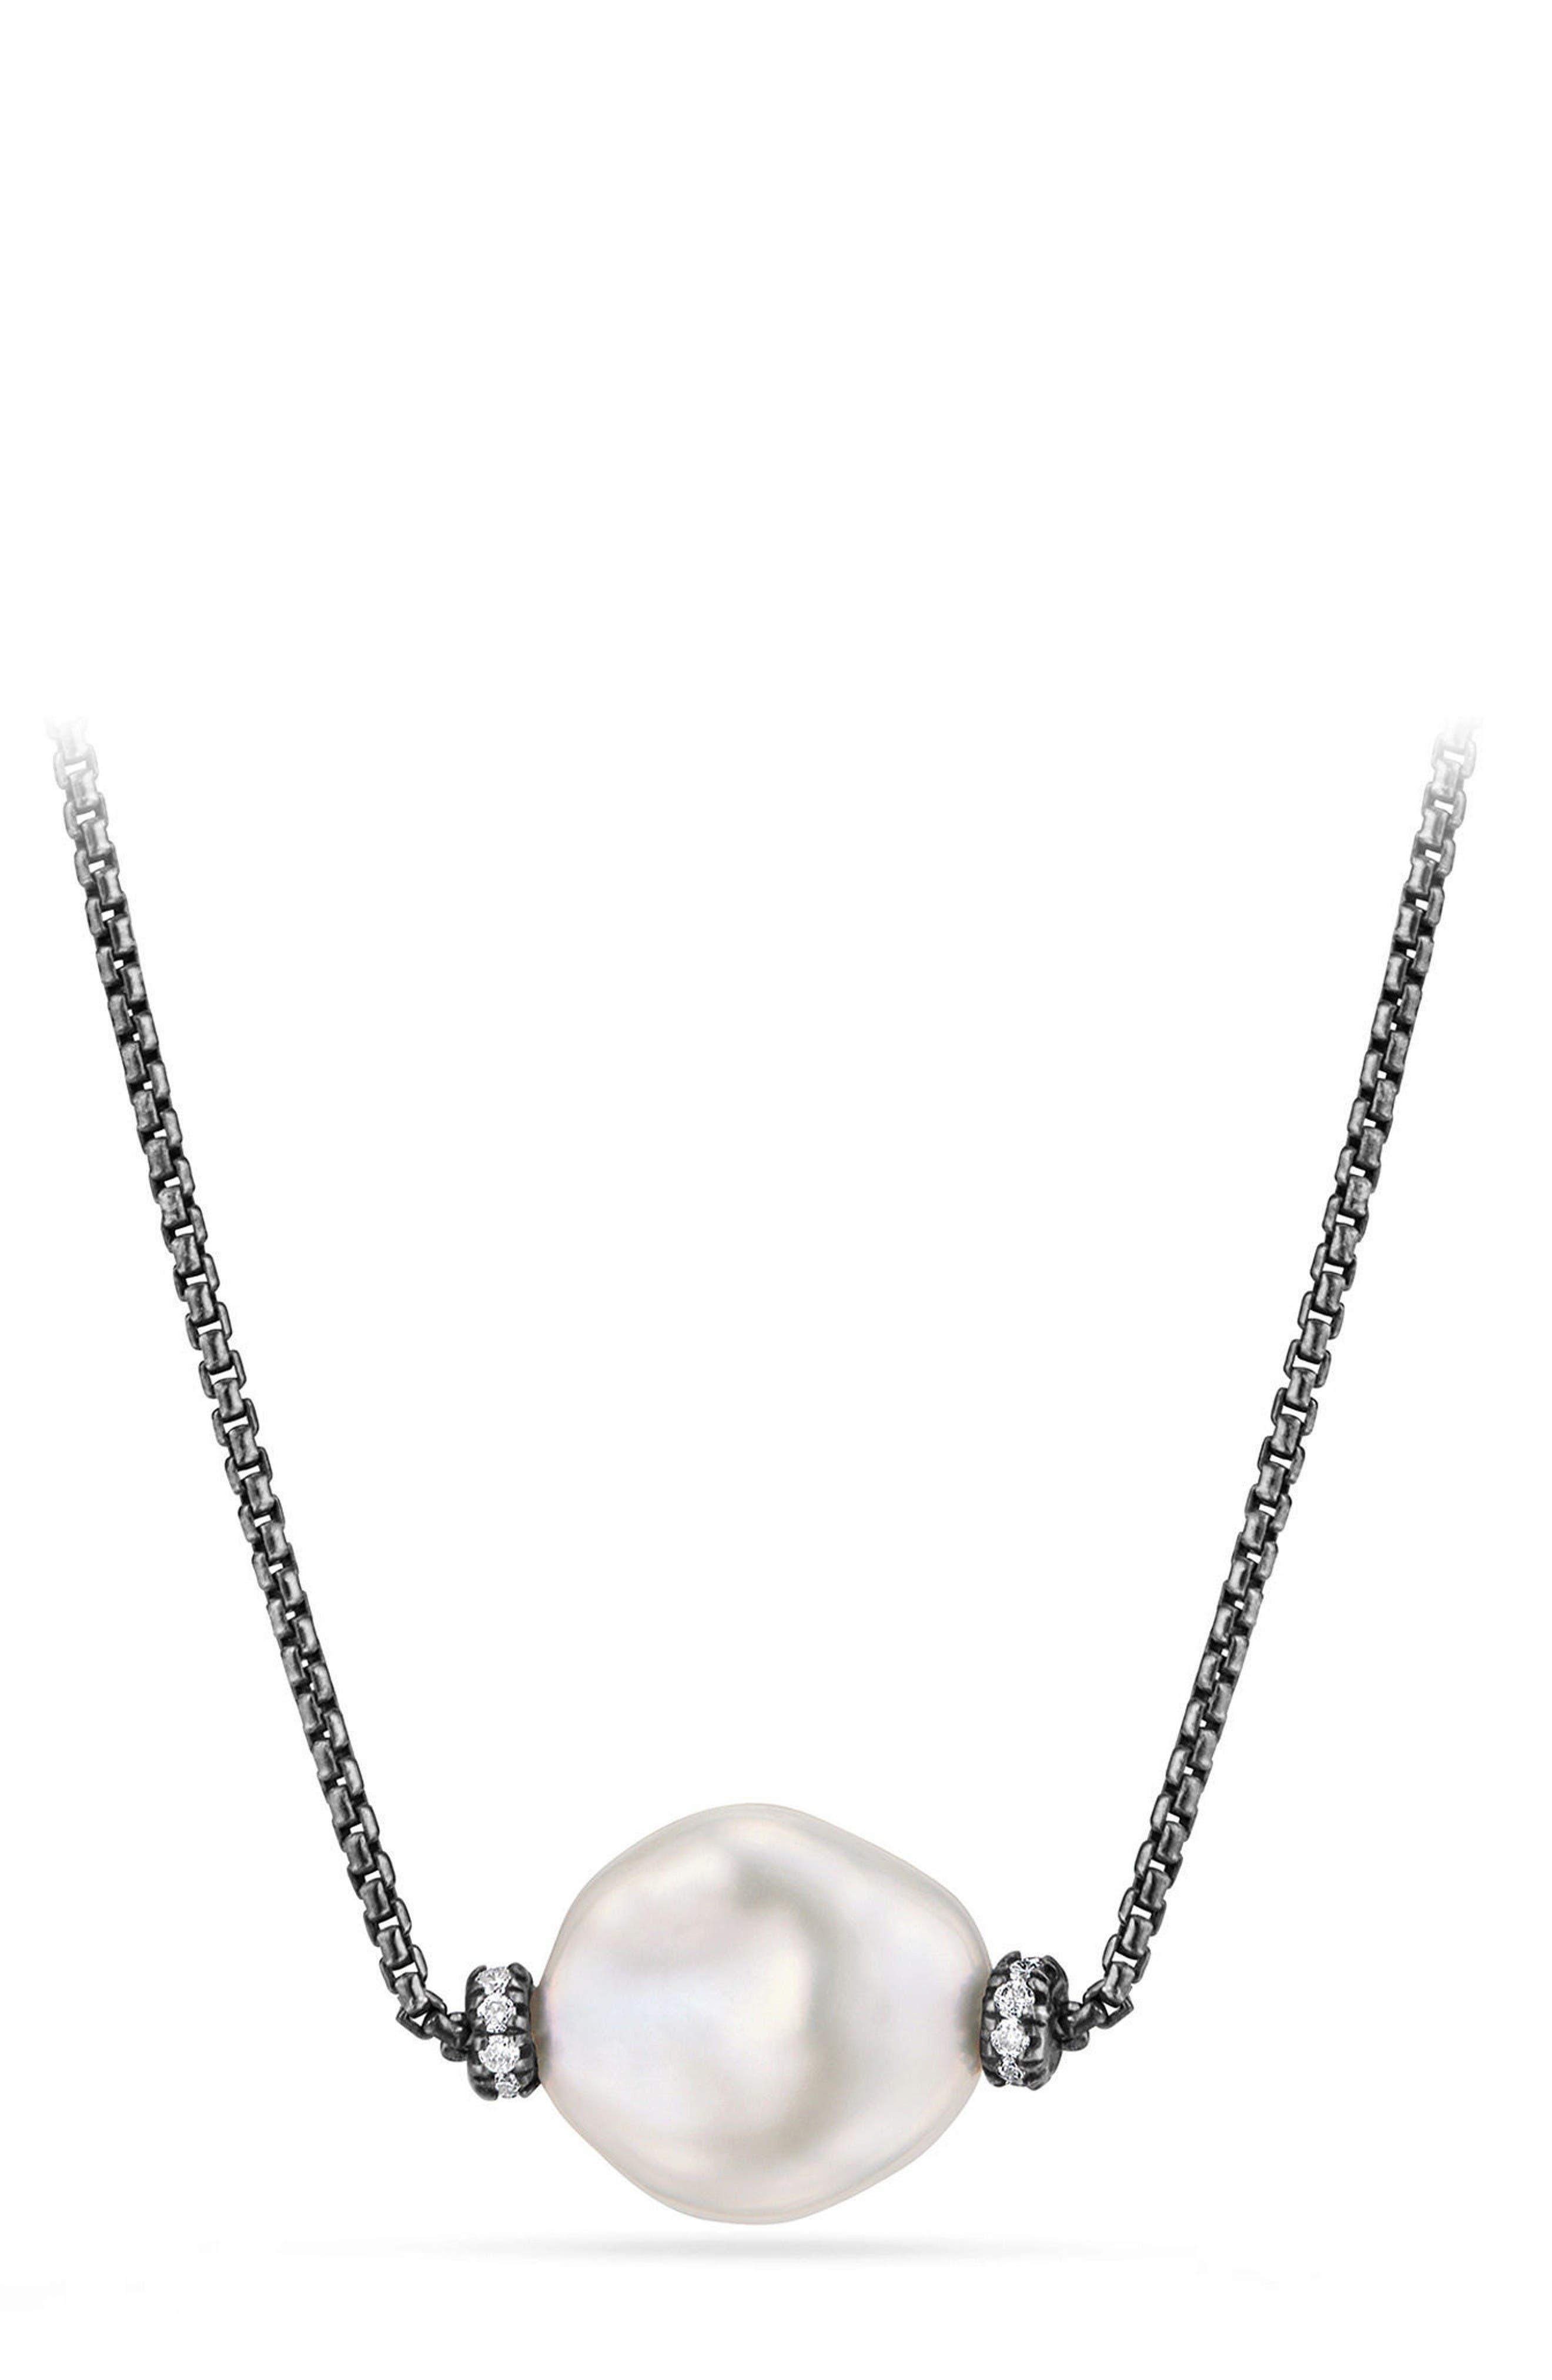 David Yurman Solari Pearl & Diamond Station Necklace